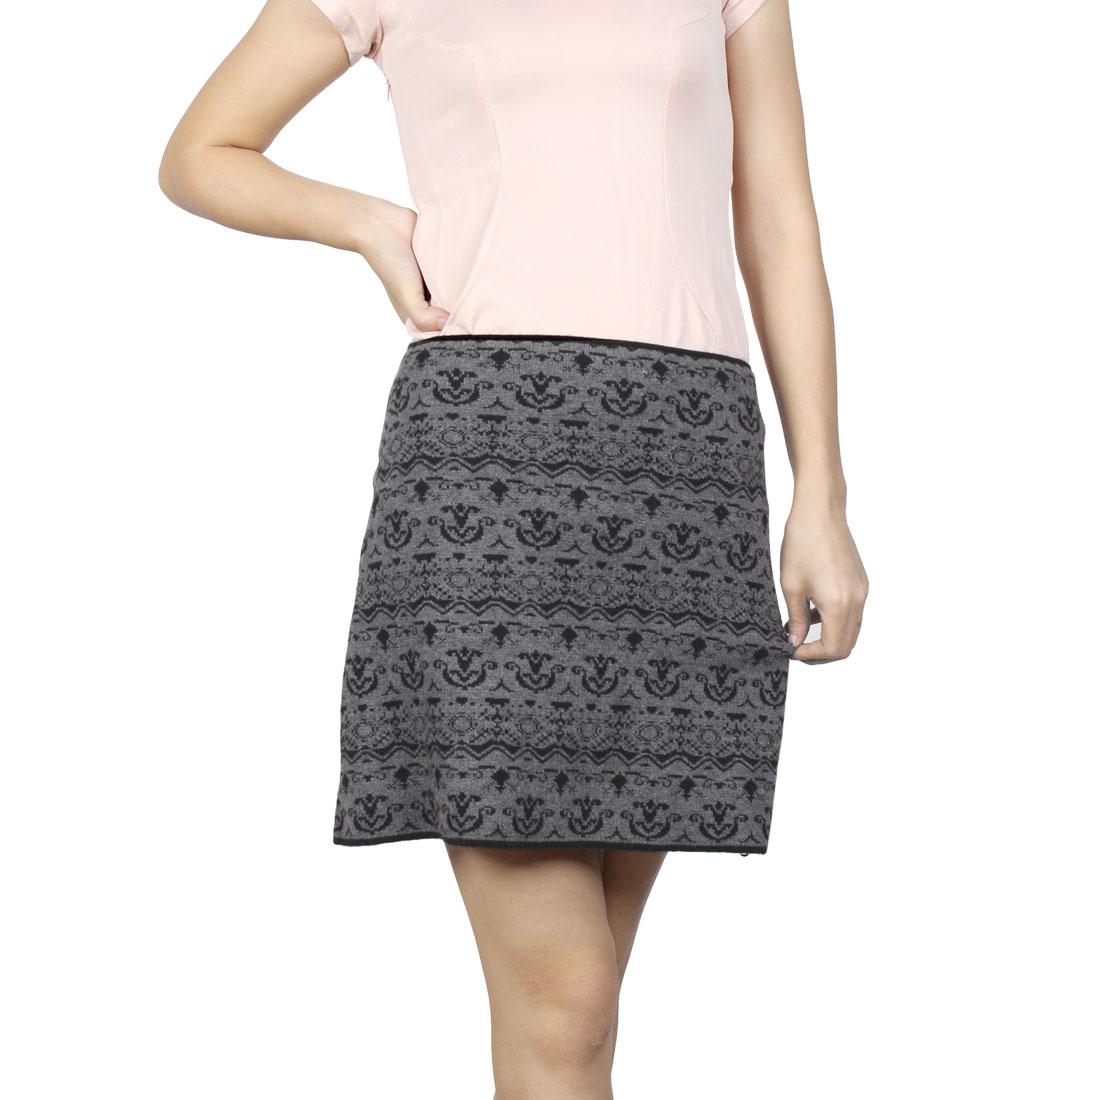 Ladies Autumn Black Jacquard Pattern Gray Elastic Knitting Mini Skirt XS